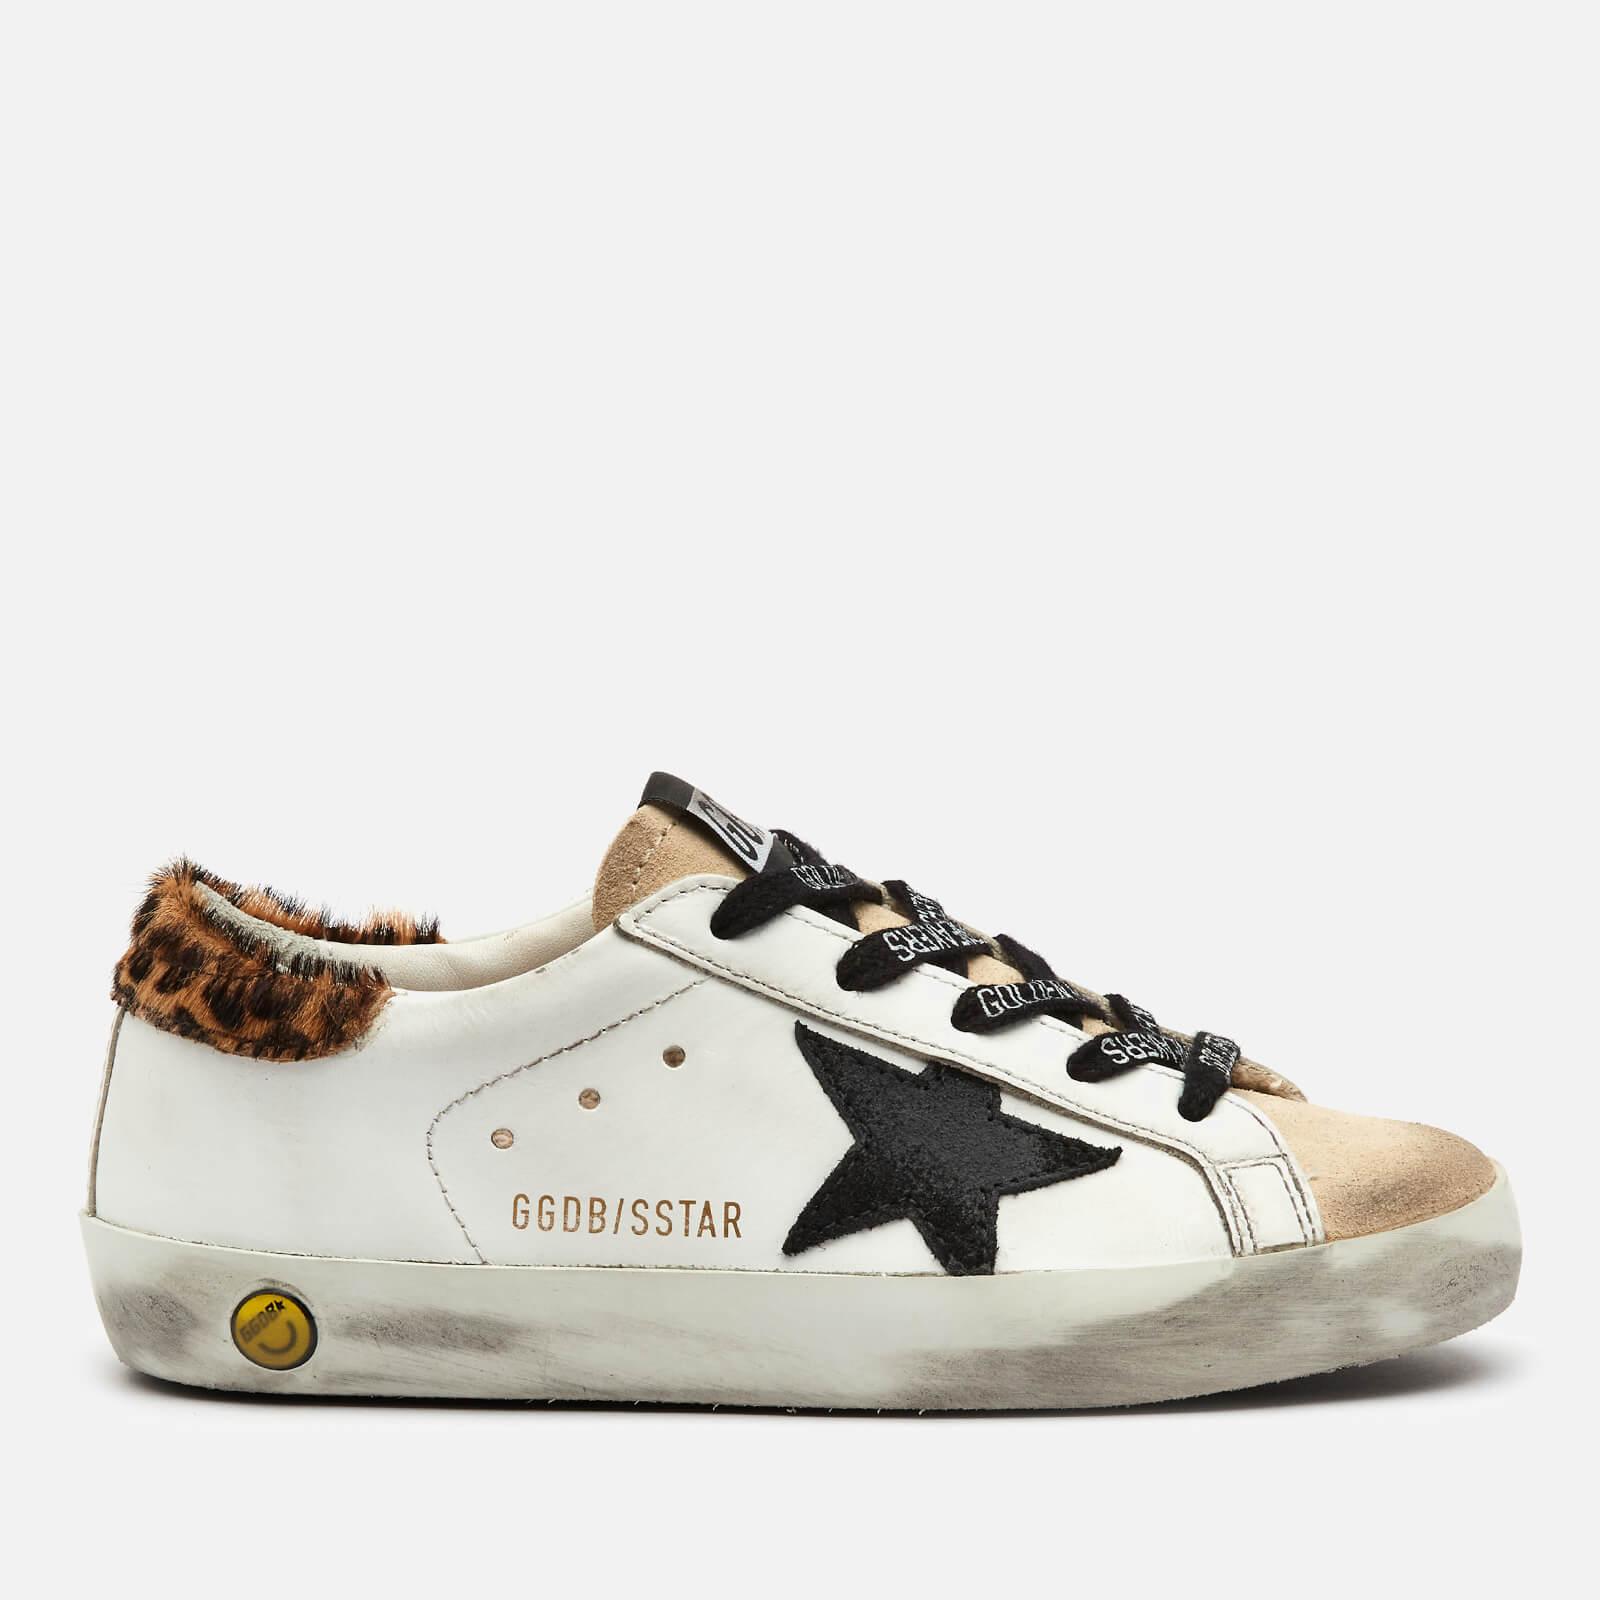 Golden Goose Deluxe Brand Kids' Super Star Leather Trainers - White/Beige/Black/Beige Brown Leo - UK 12 Kids